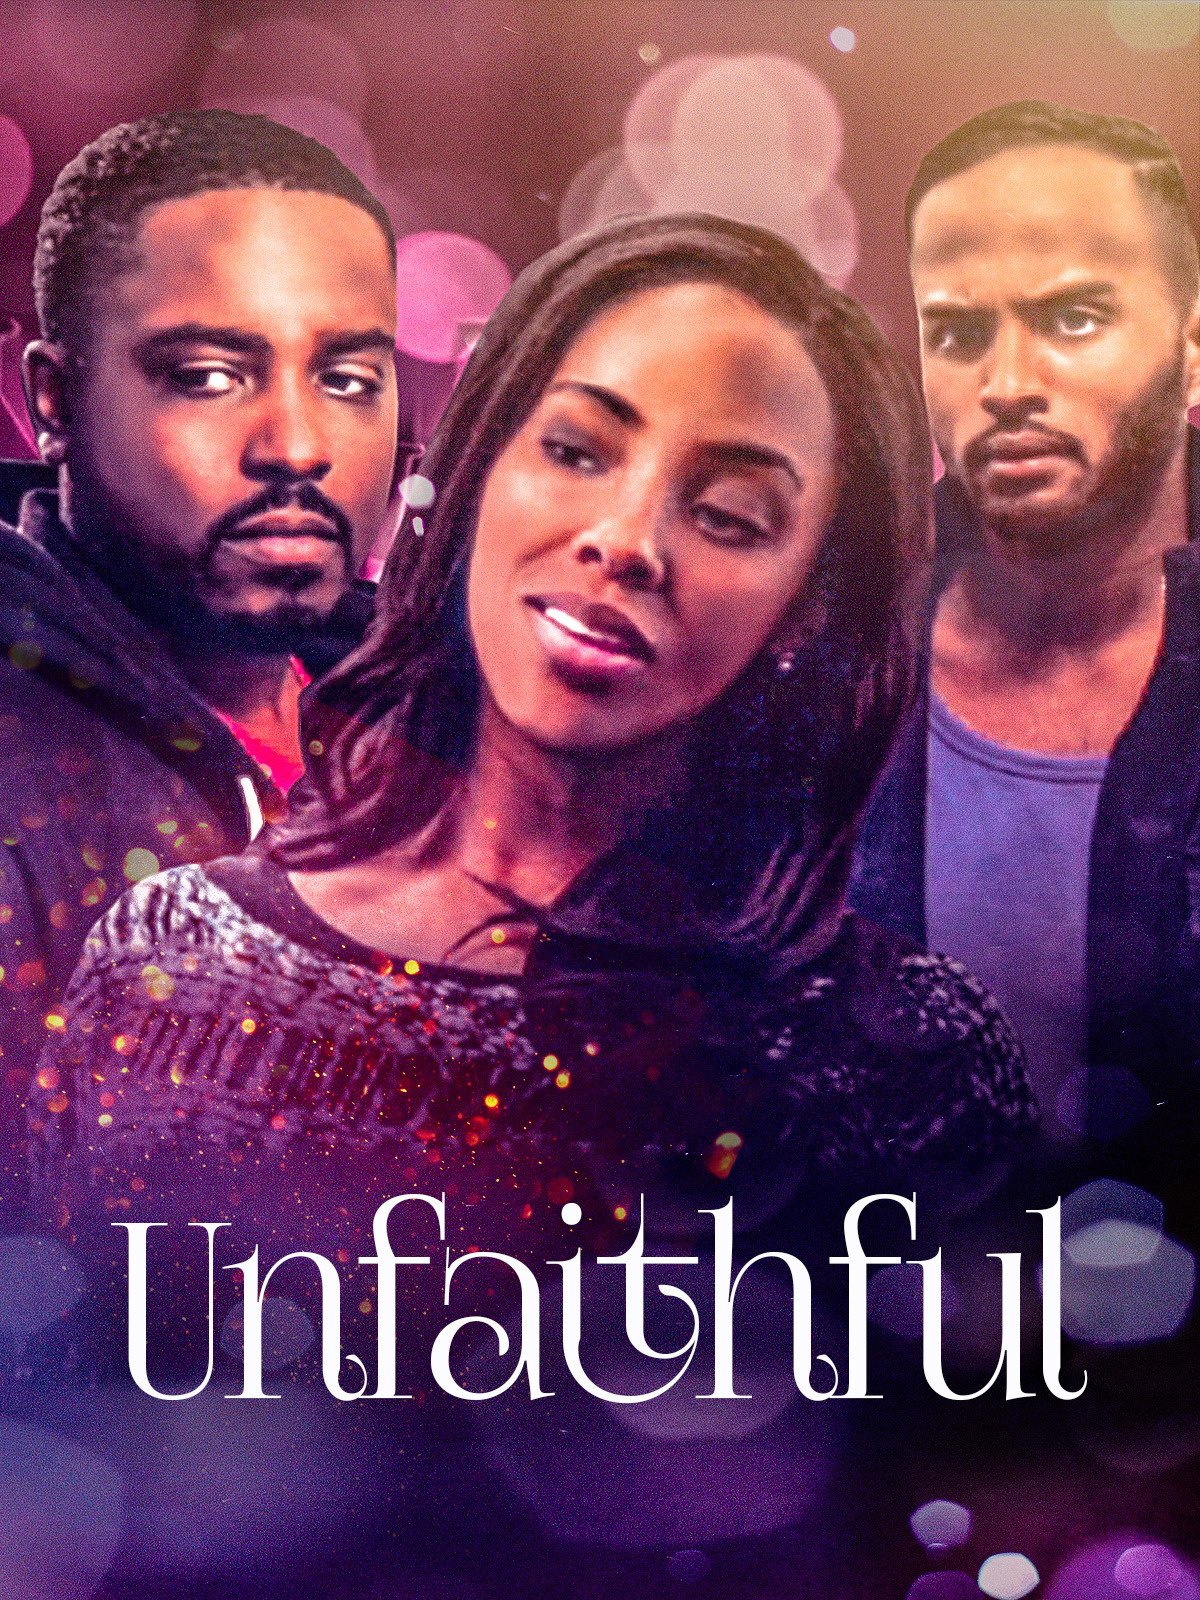 Unfaithful full movie